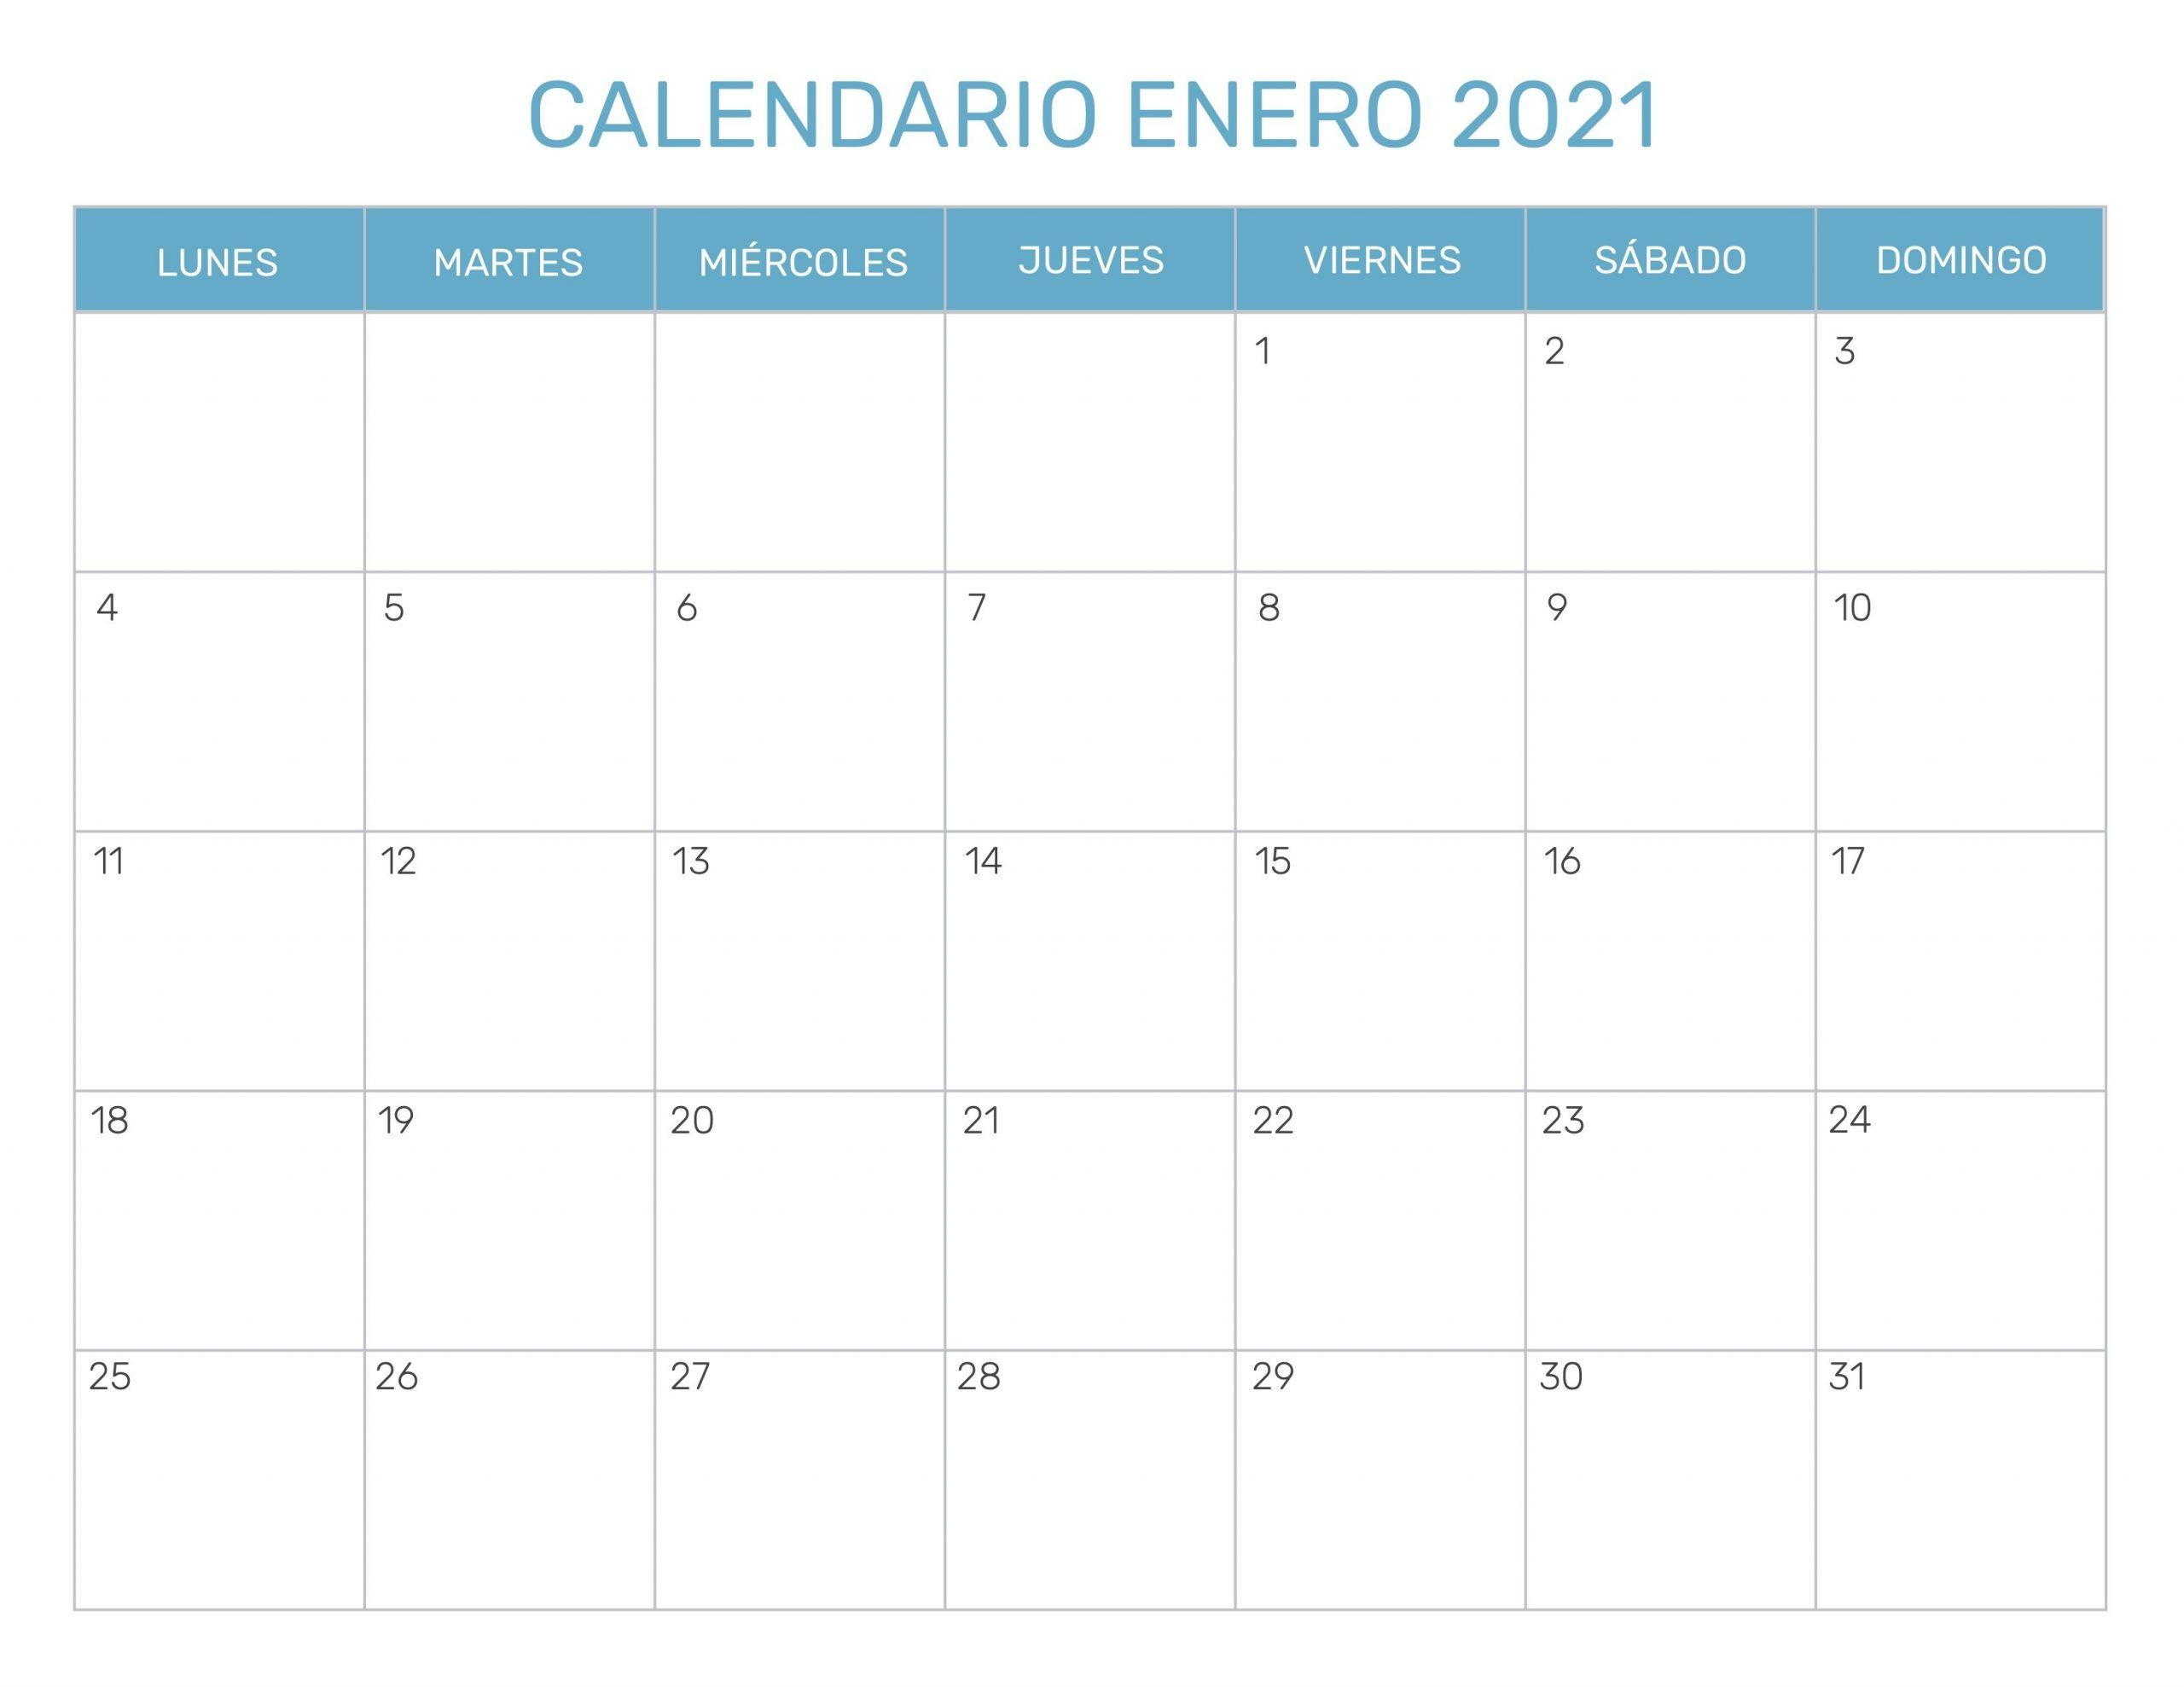 Calendario Mensual Para Imprimir Año 2021  Calendario Por Mes Para Imprimir 2021